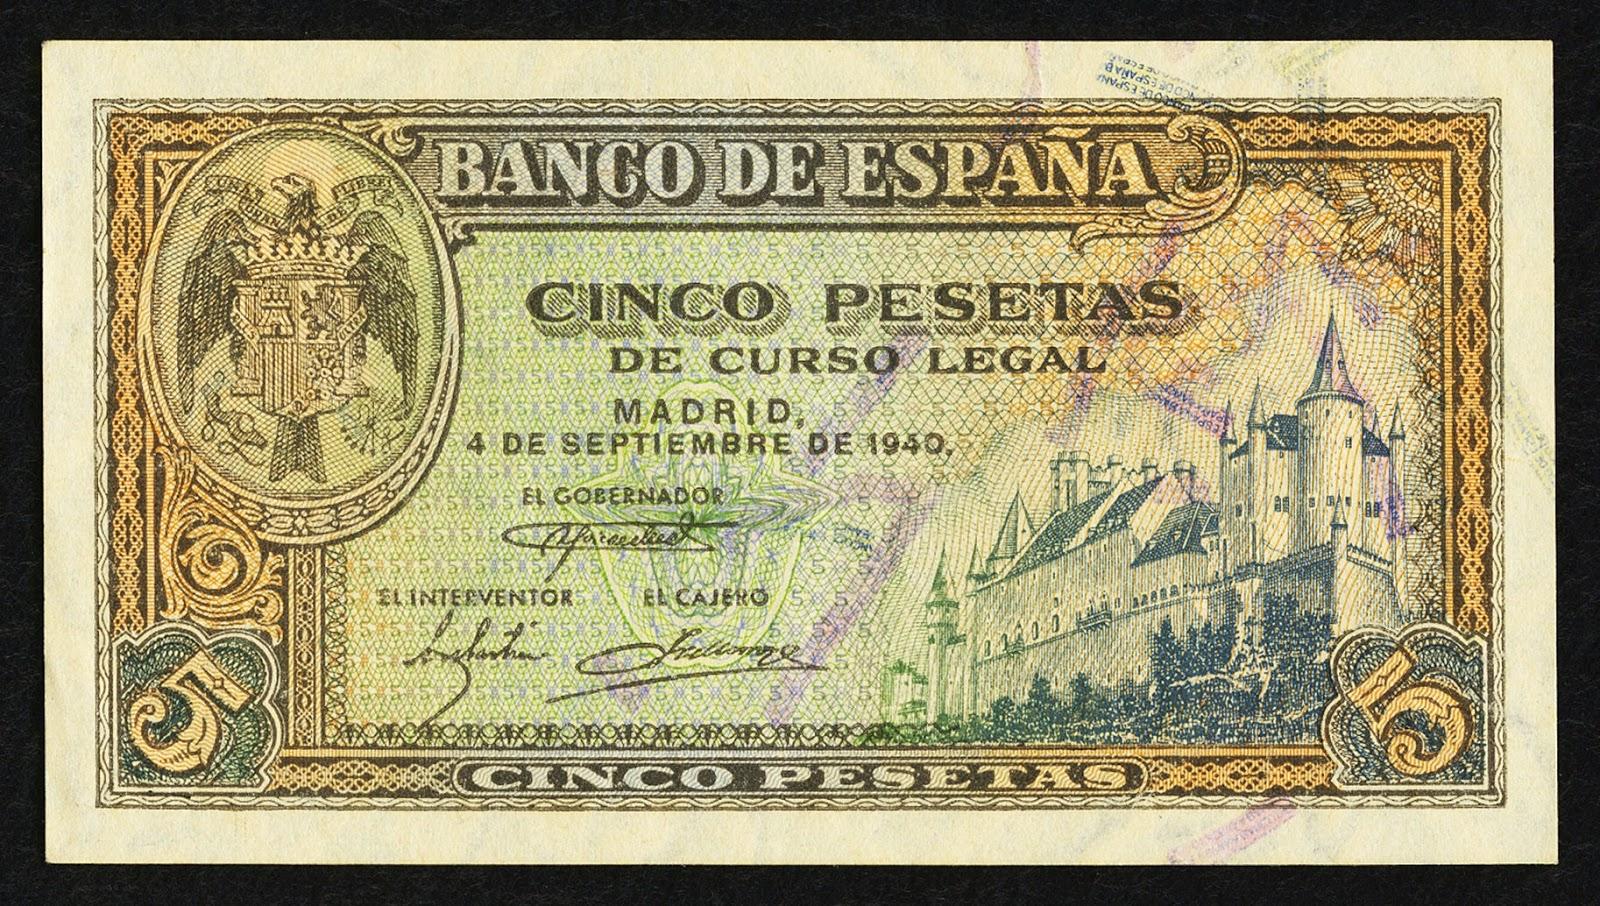 Spain Banknotes 5 Pesetas banknote 1940 Alcazar of Segovia